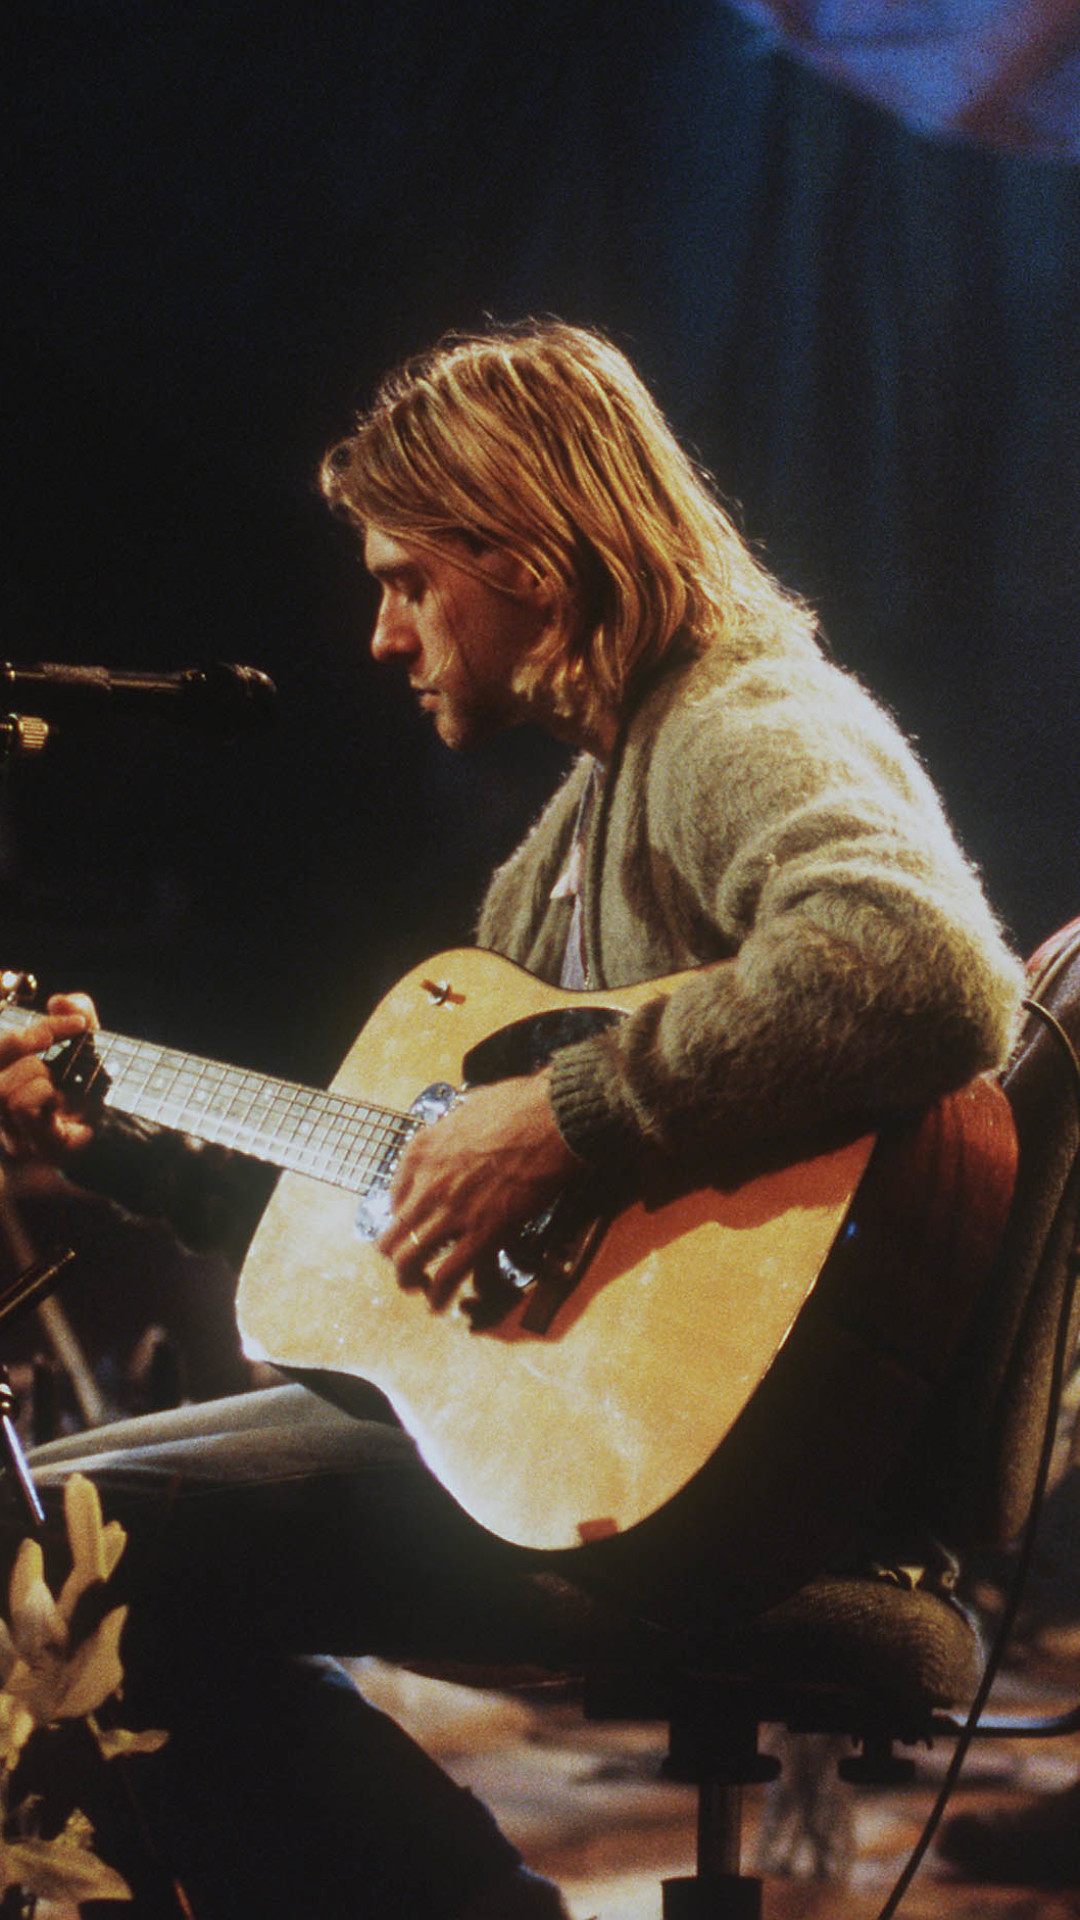 Nirvana iphone wallpaper 65 images - Kurt cobain nirvana wallpaper ...